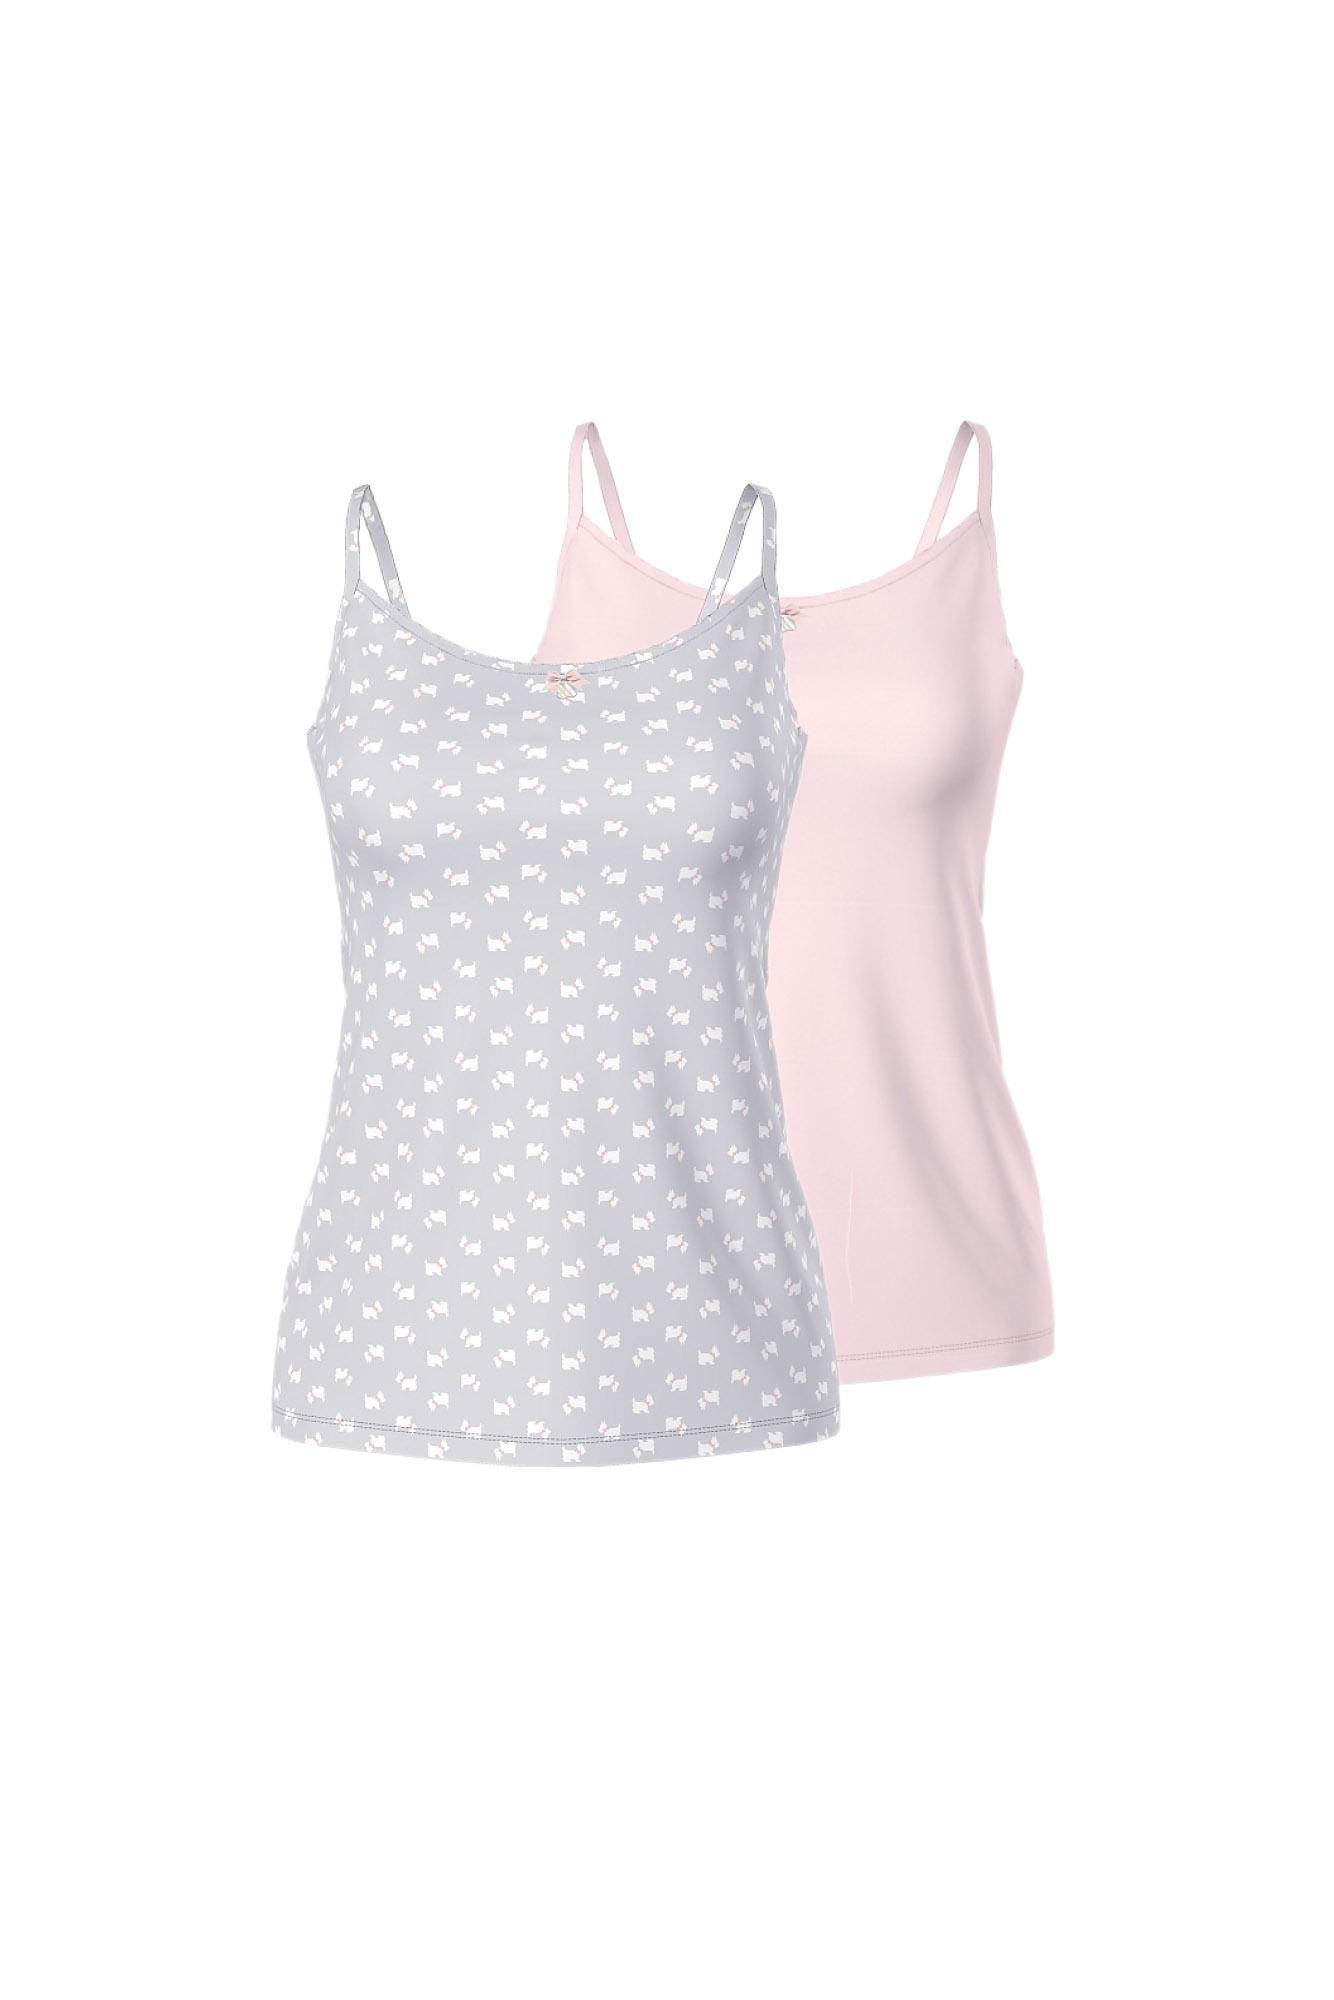 Women's 2 Pack Print Vests